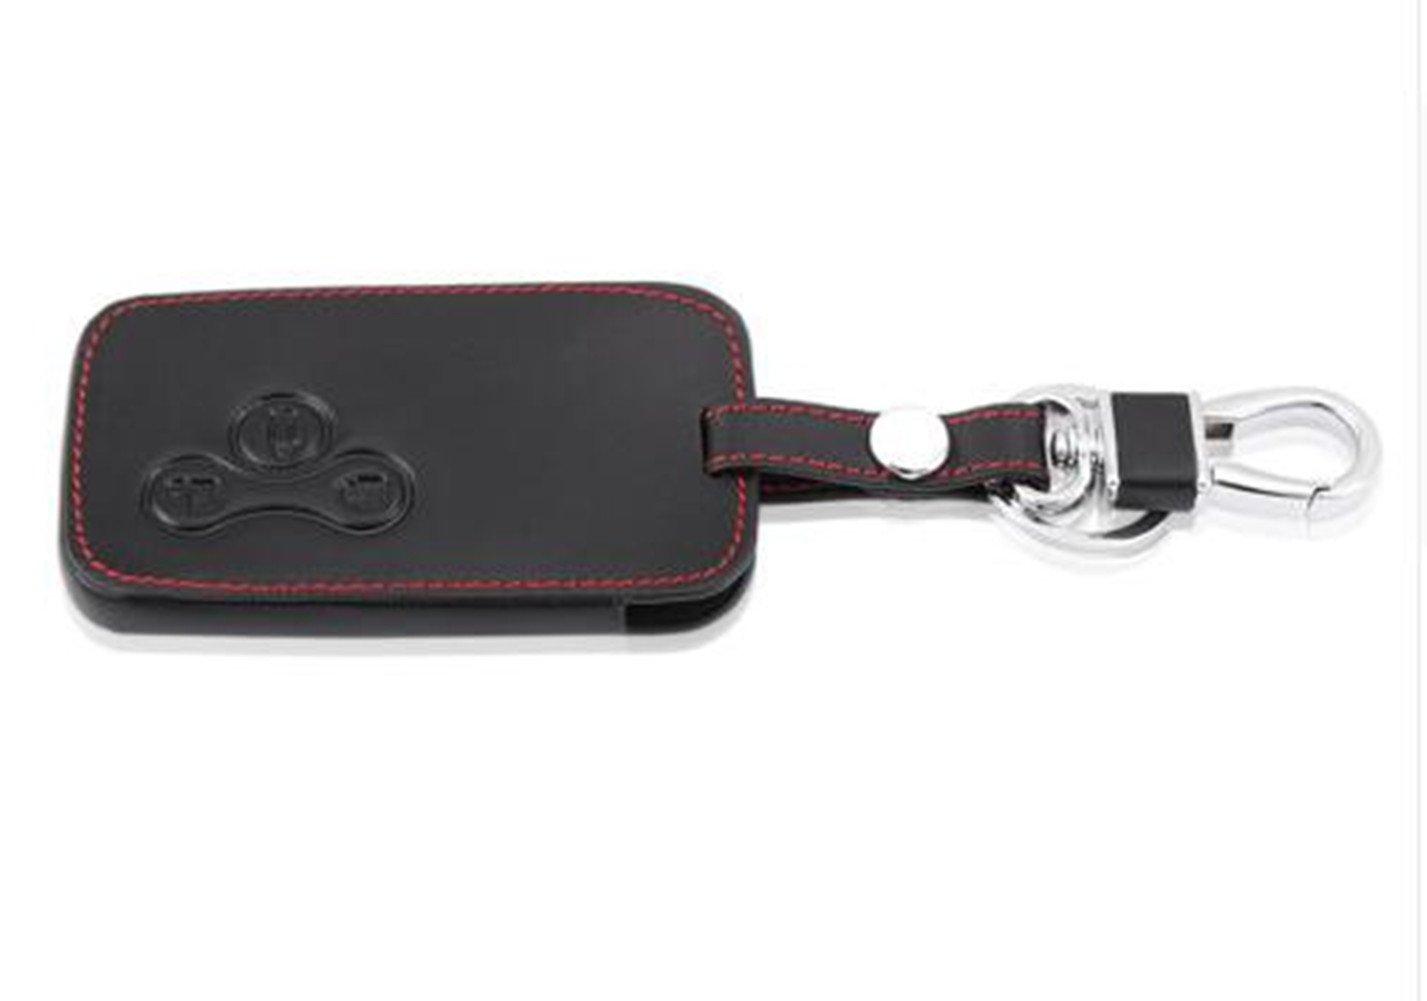 Happyit Leather Car Remote Key case per Renault Megane r.s Scenic 3/tasto di chiave Smart Key